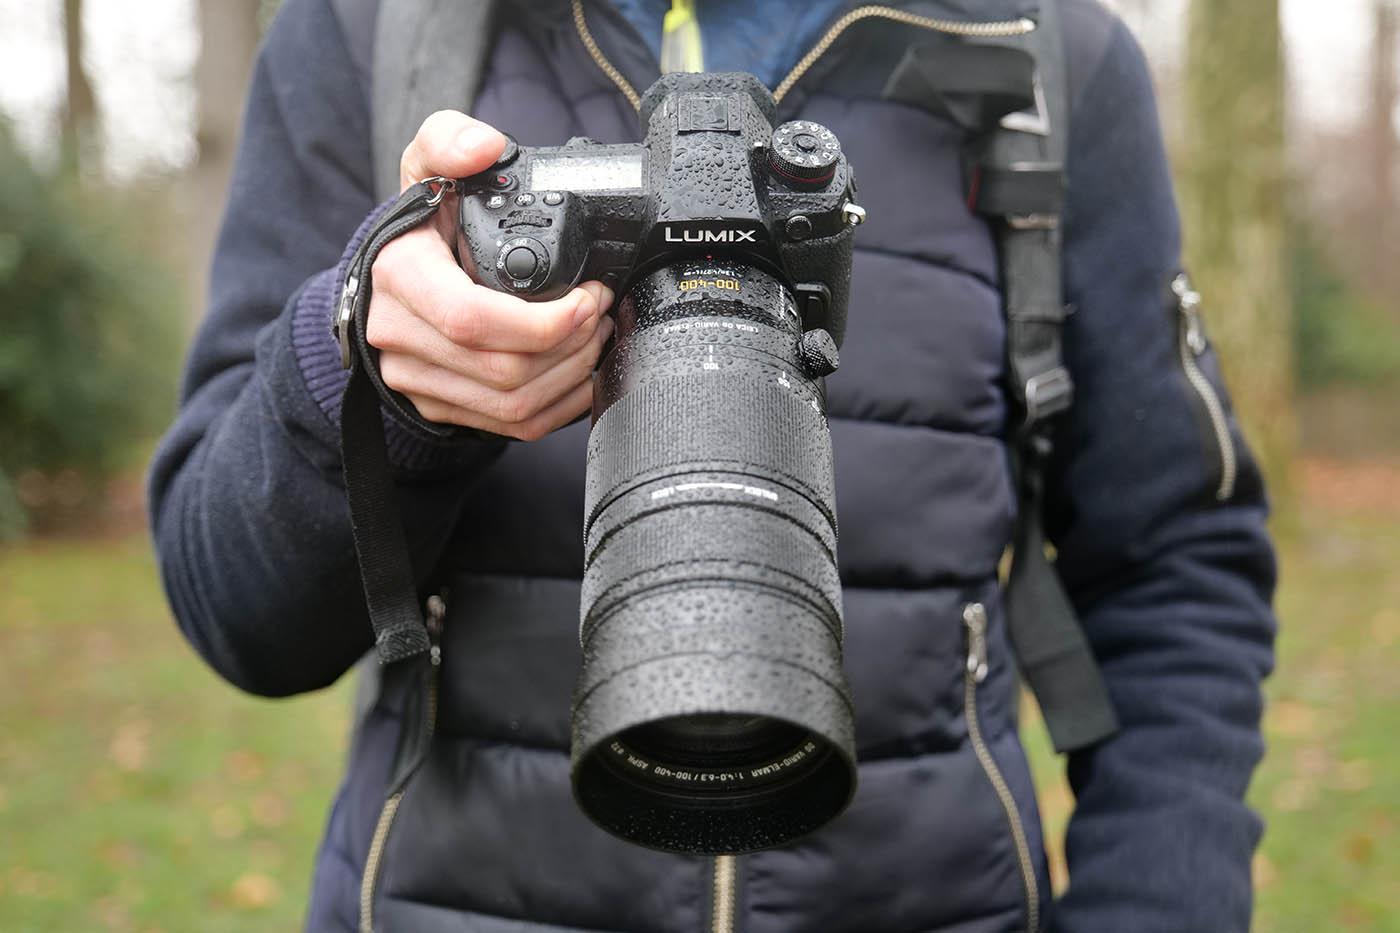 Prise en main de l'objectif Panasonic Leica 100-400 mm f4.0-6.7